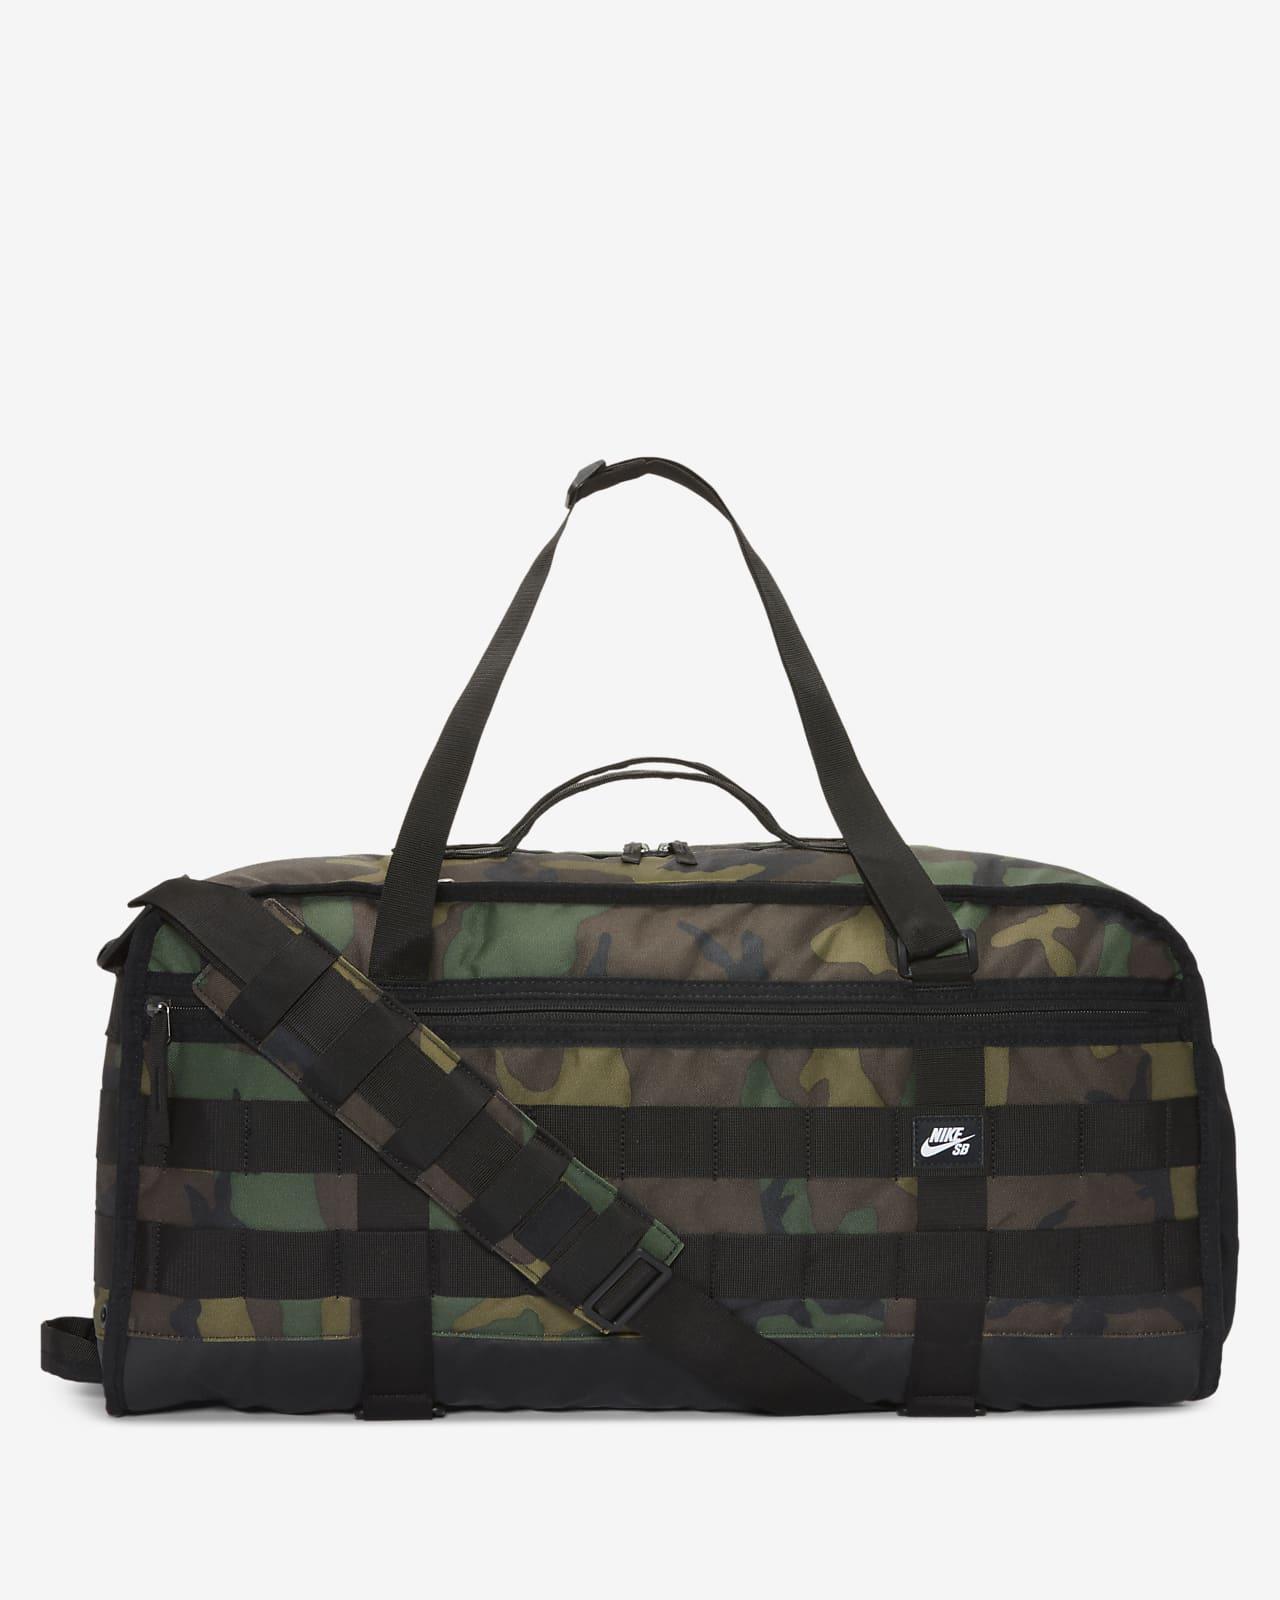 Nike SB RPM Skate Duffle Bag